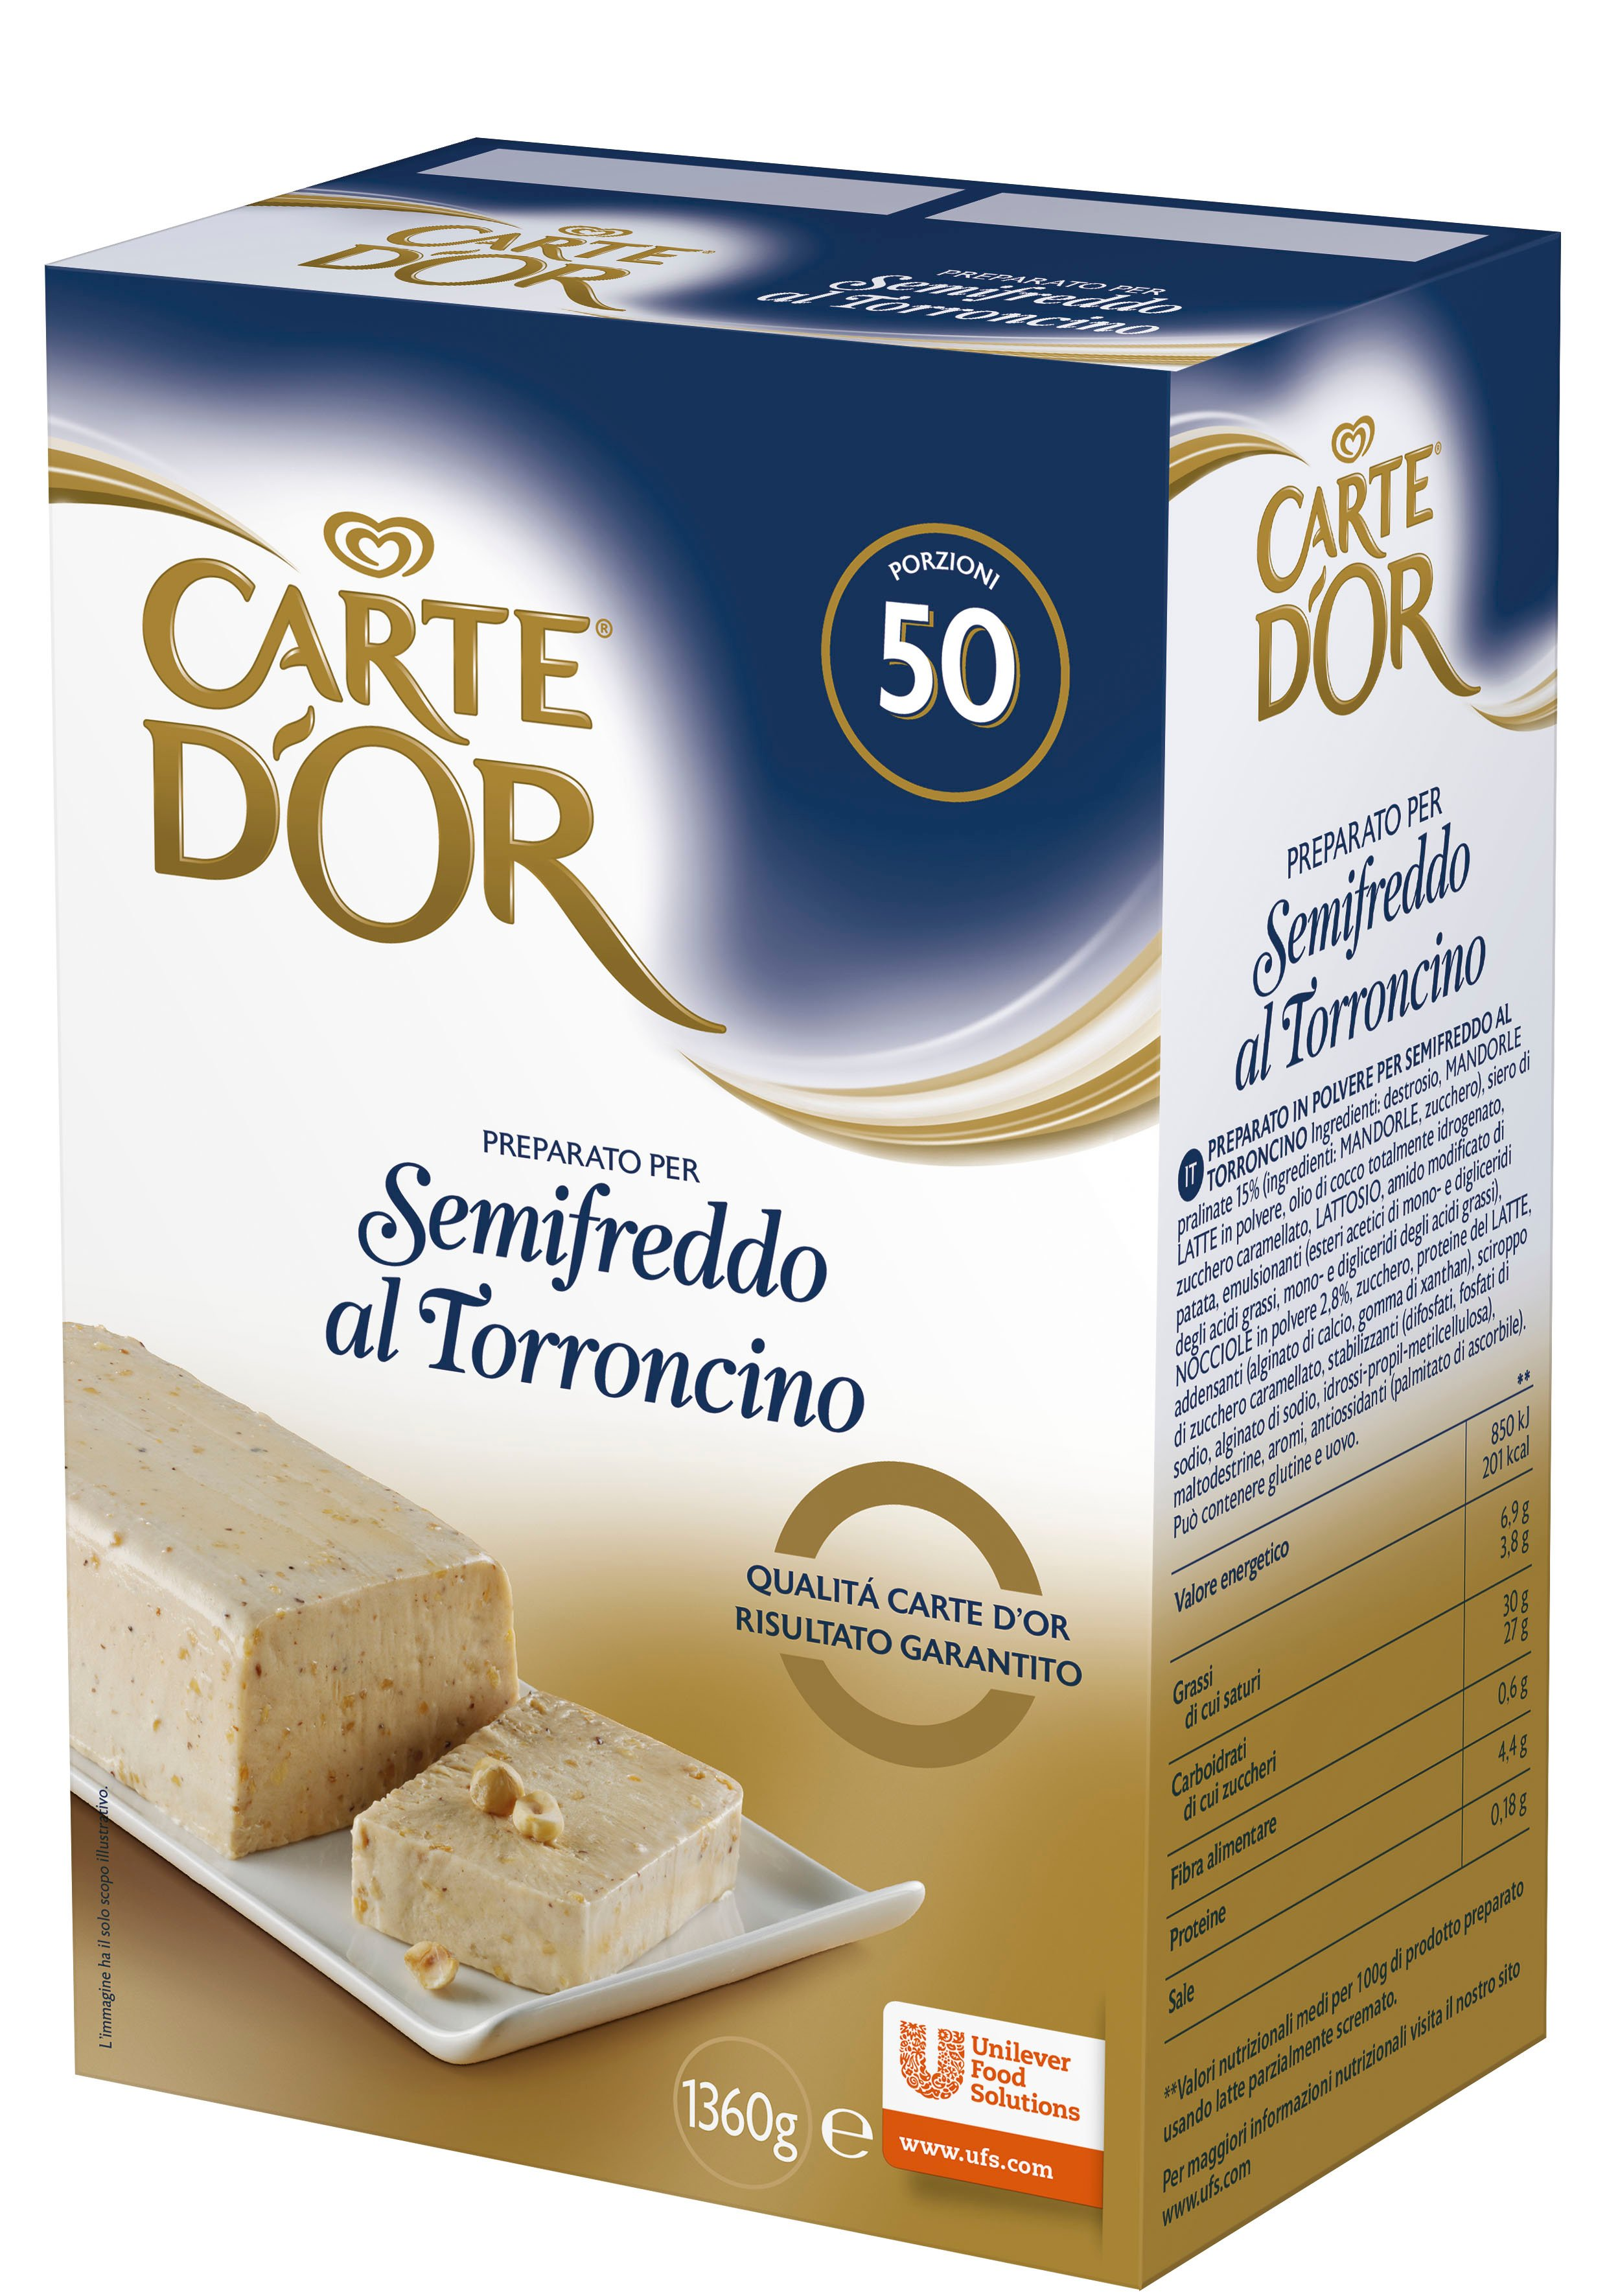 Carte d'Or preparato per Semifreddo al Torroncino 1,36 Kg